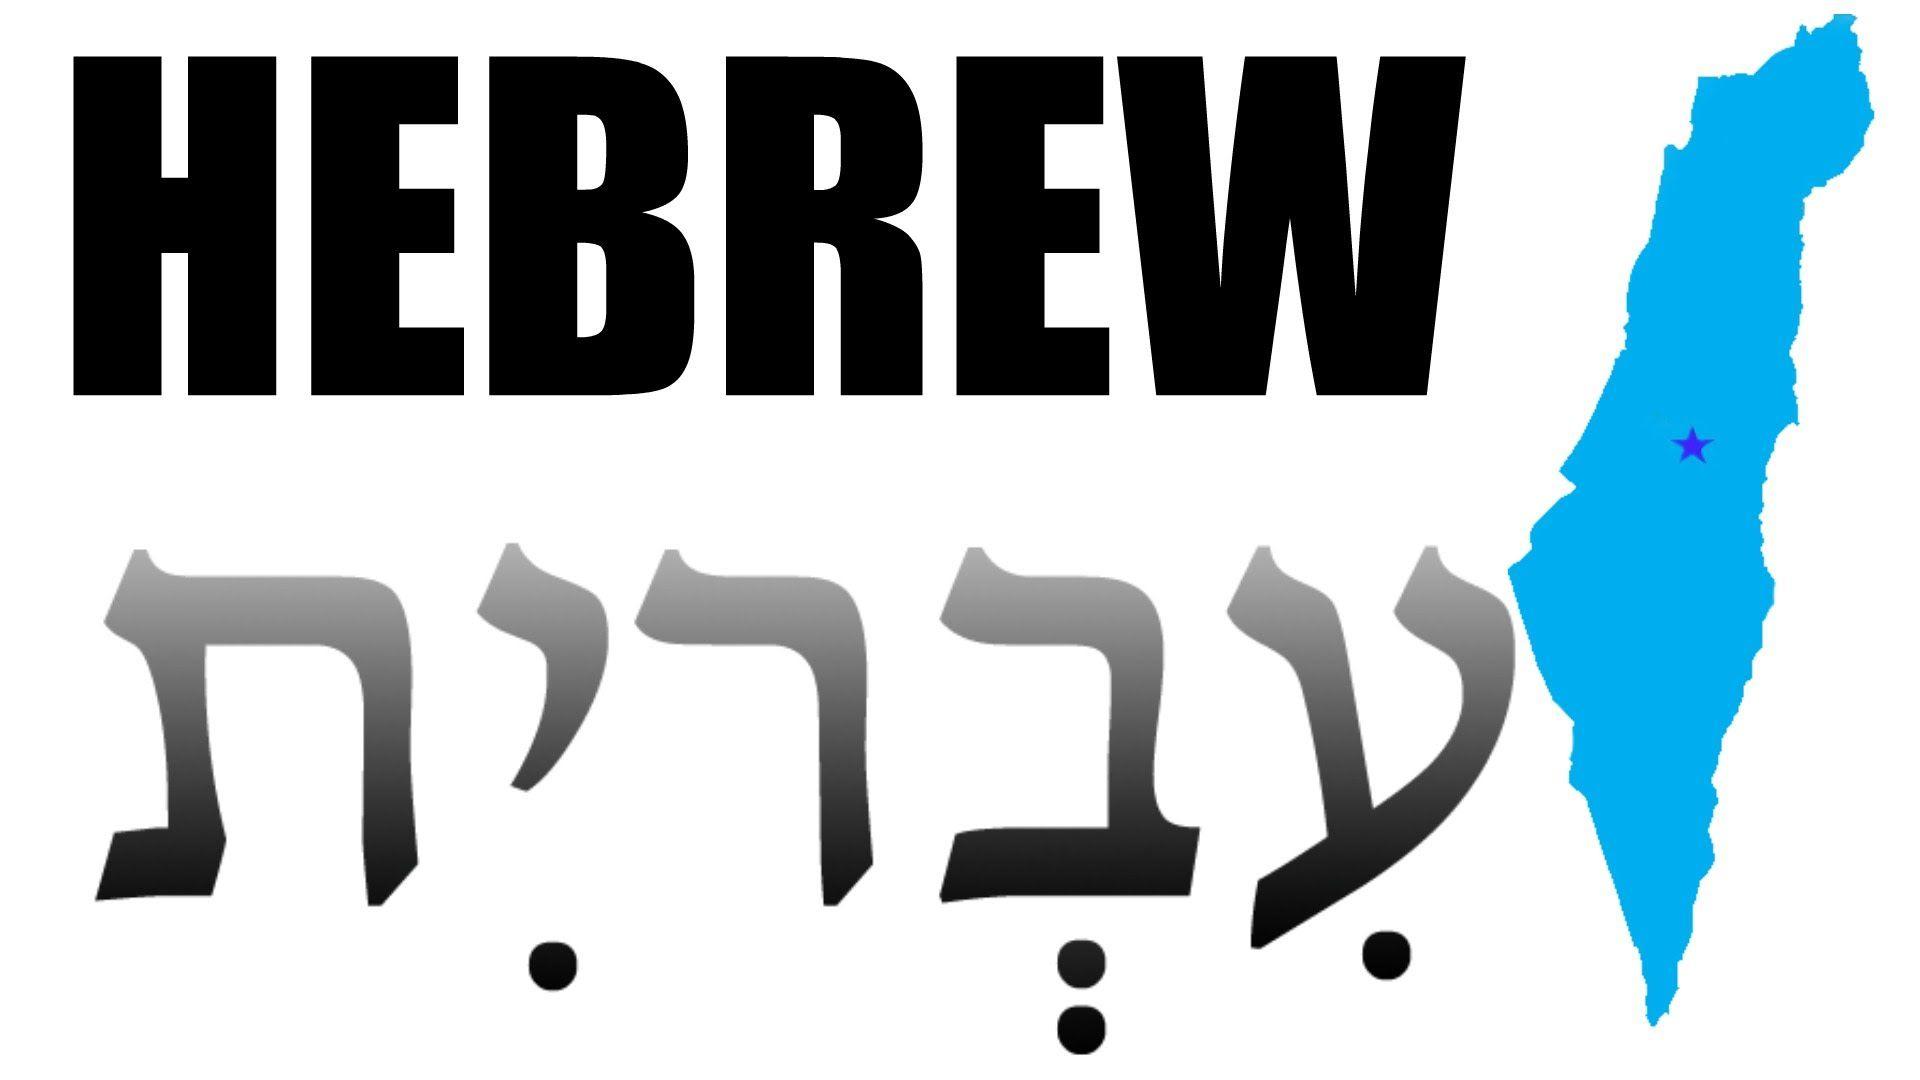 Hebrew An Ancient Language Revived Ancient languages